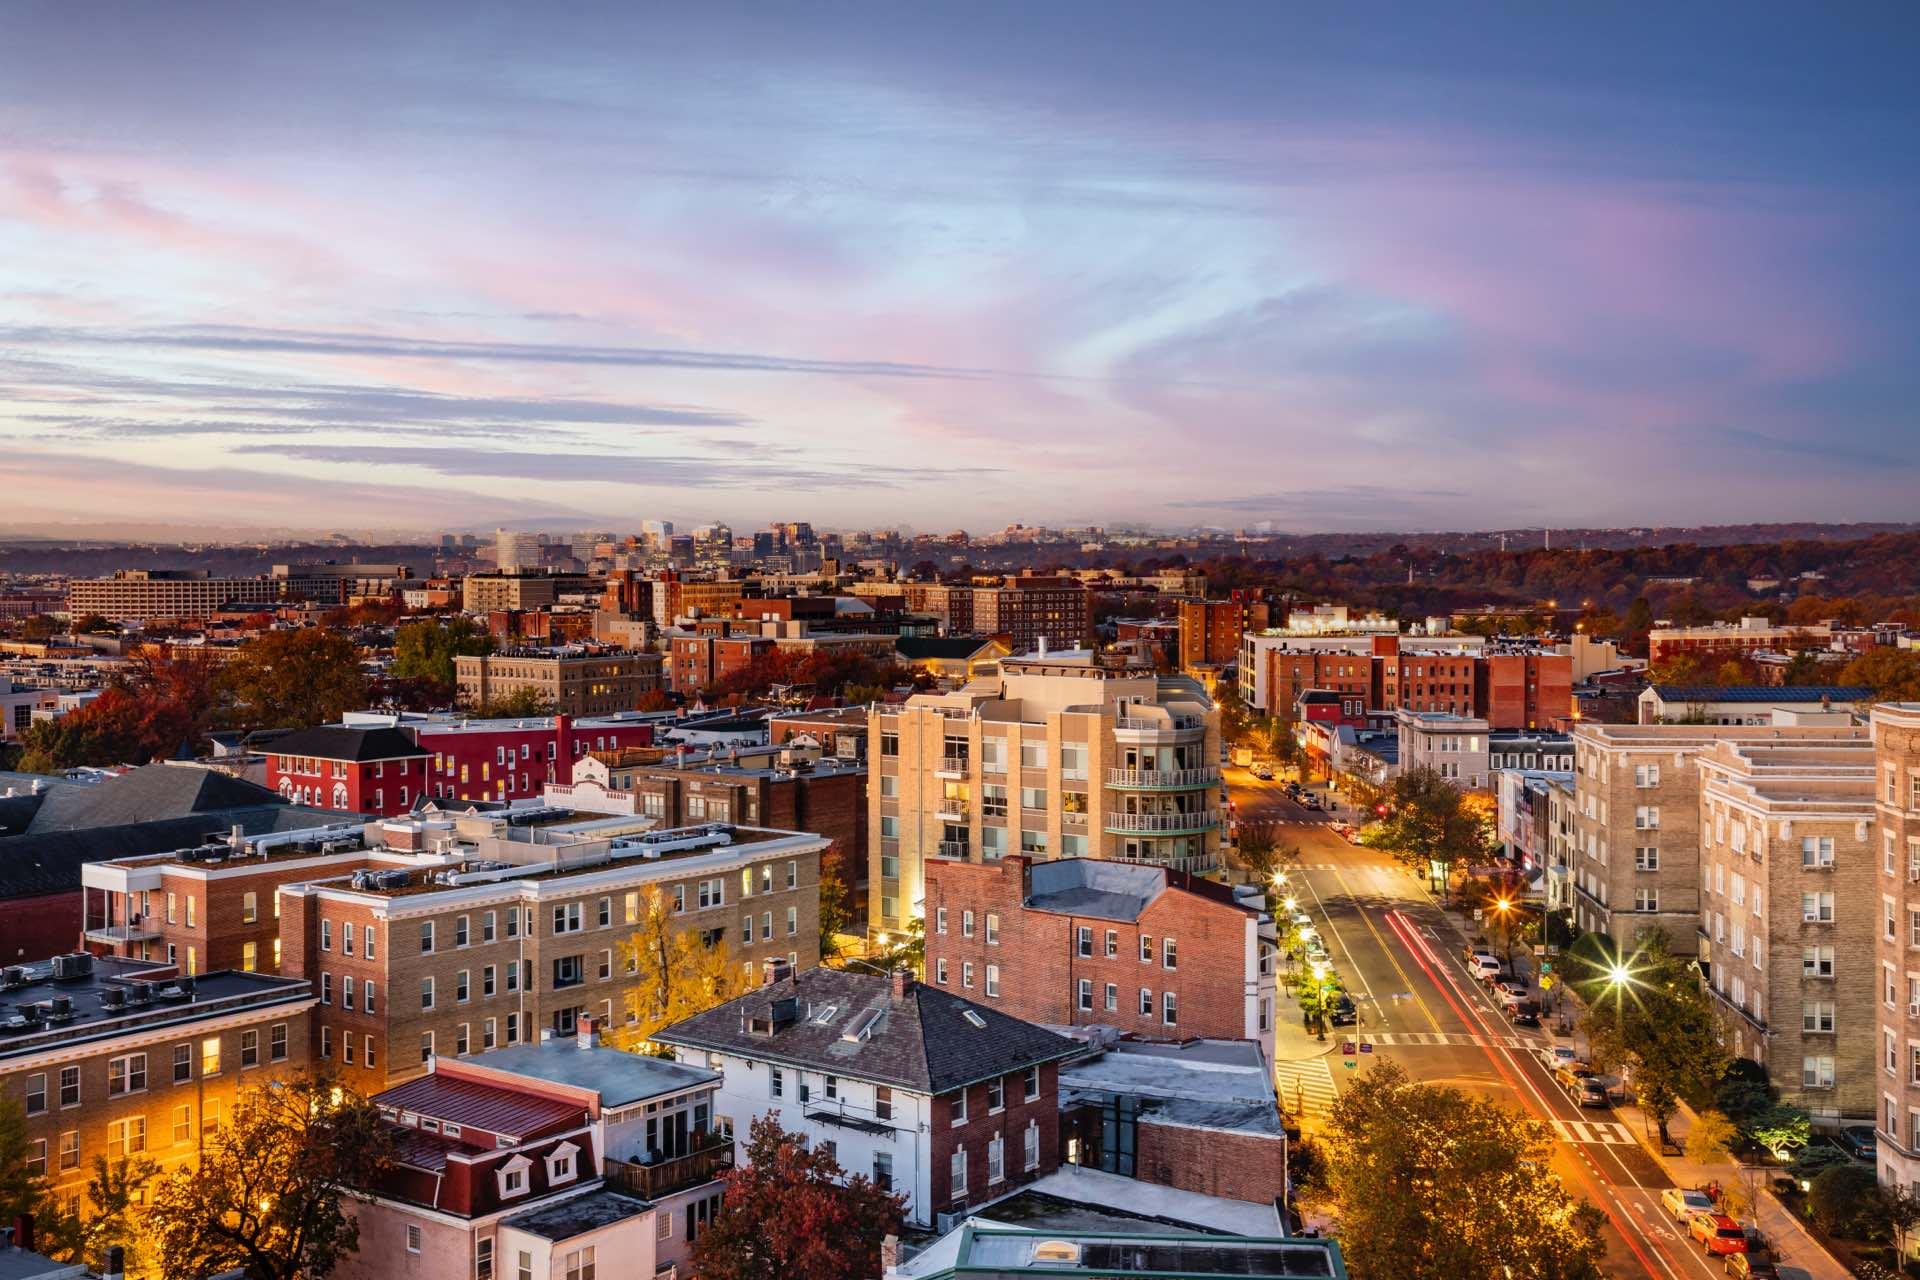 View of Adams Morgan and its urban energy